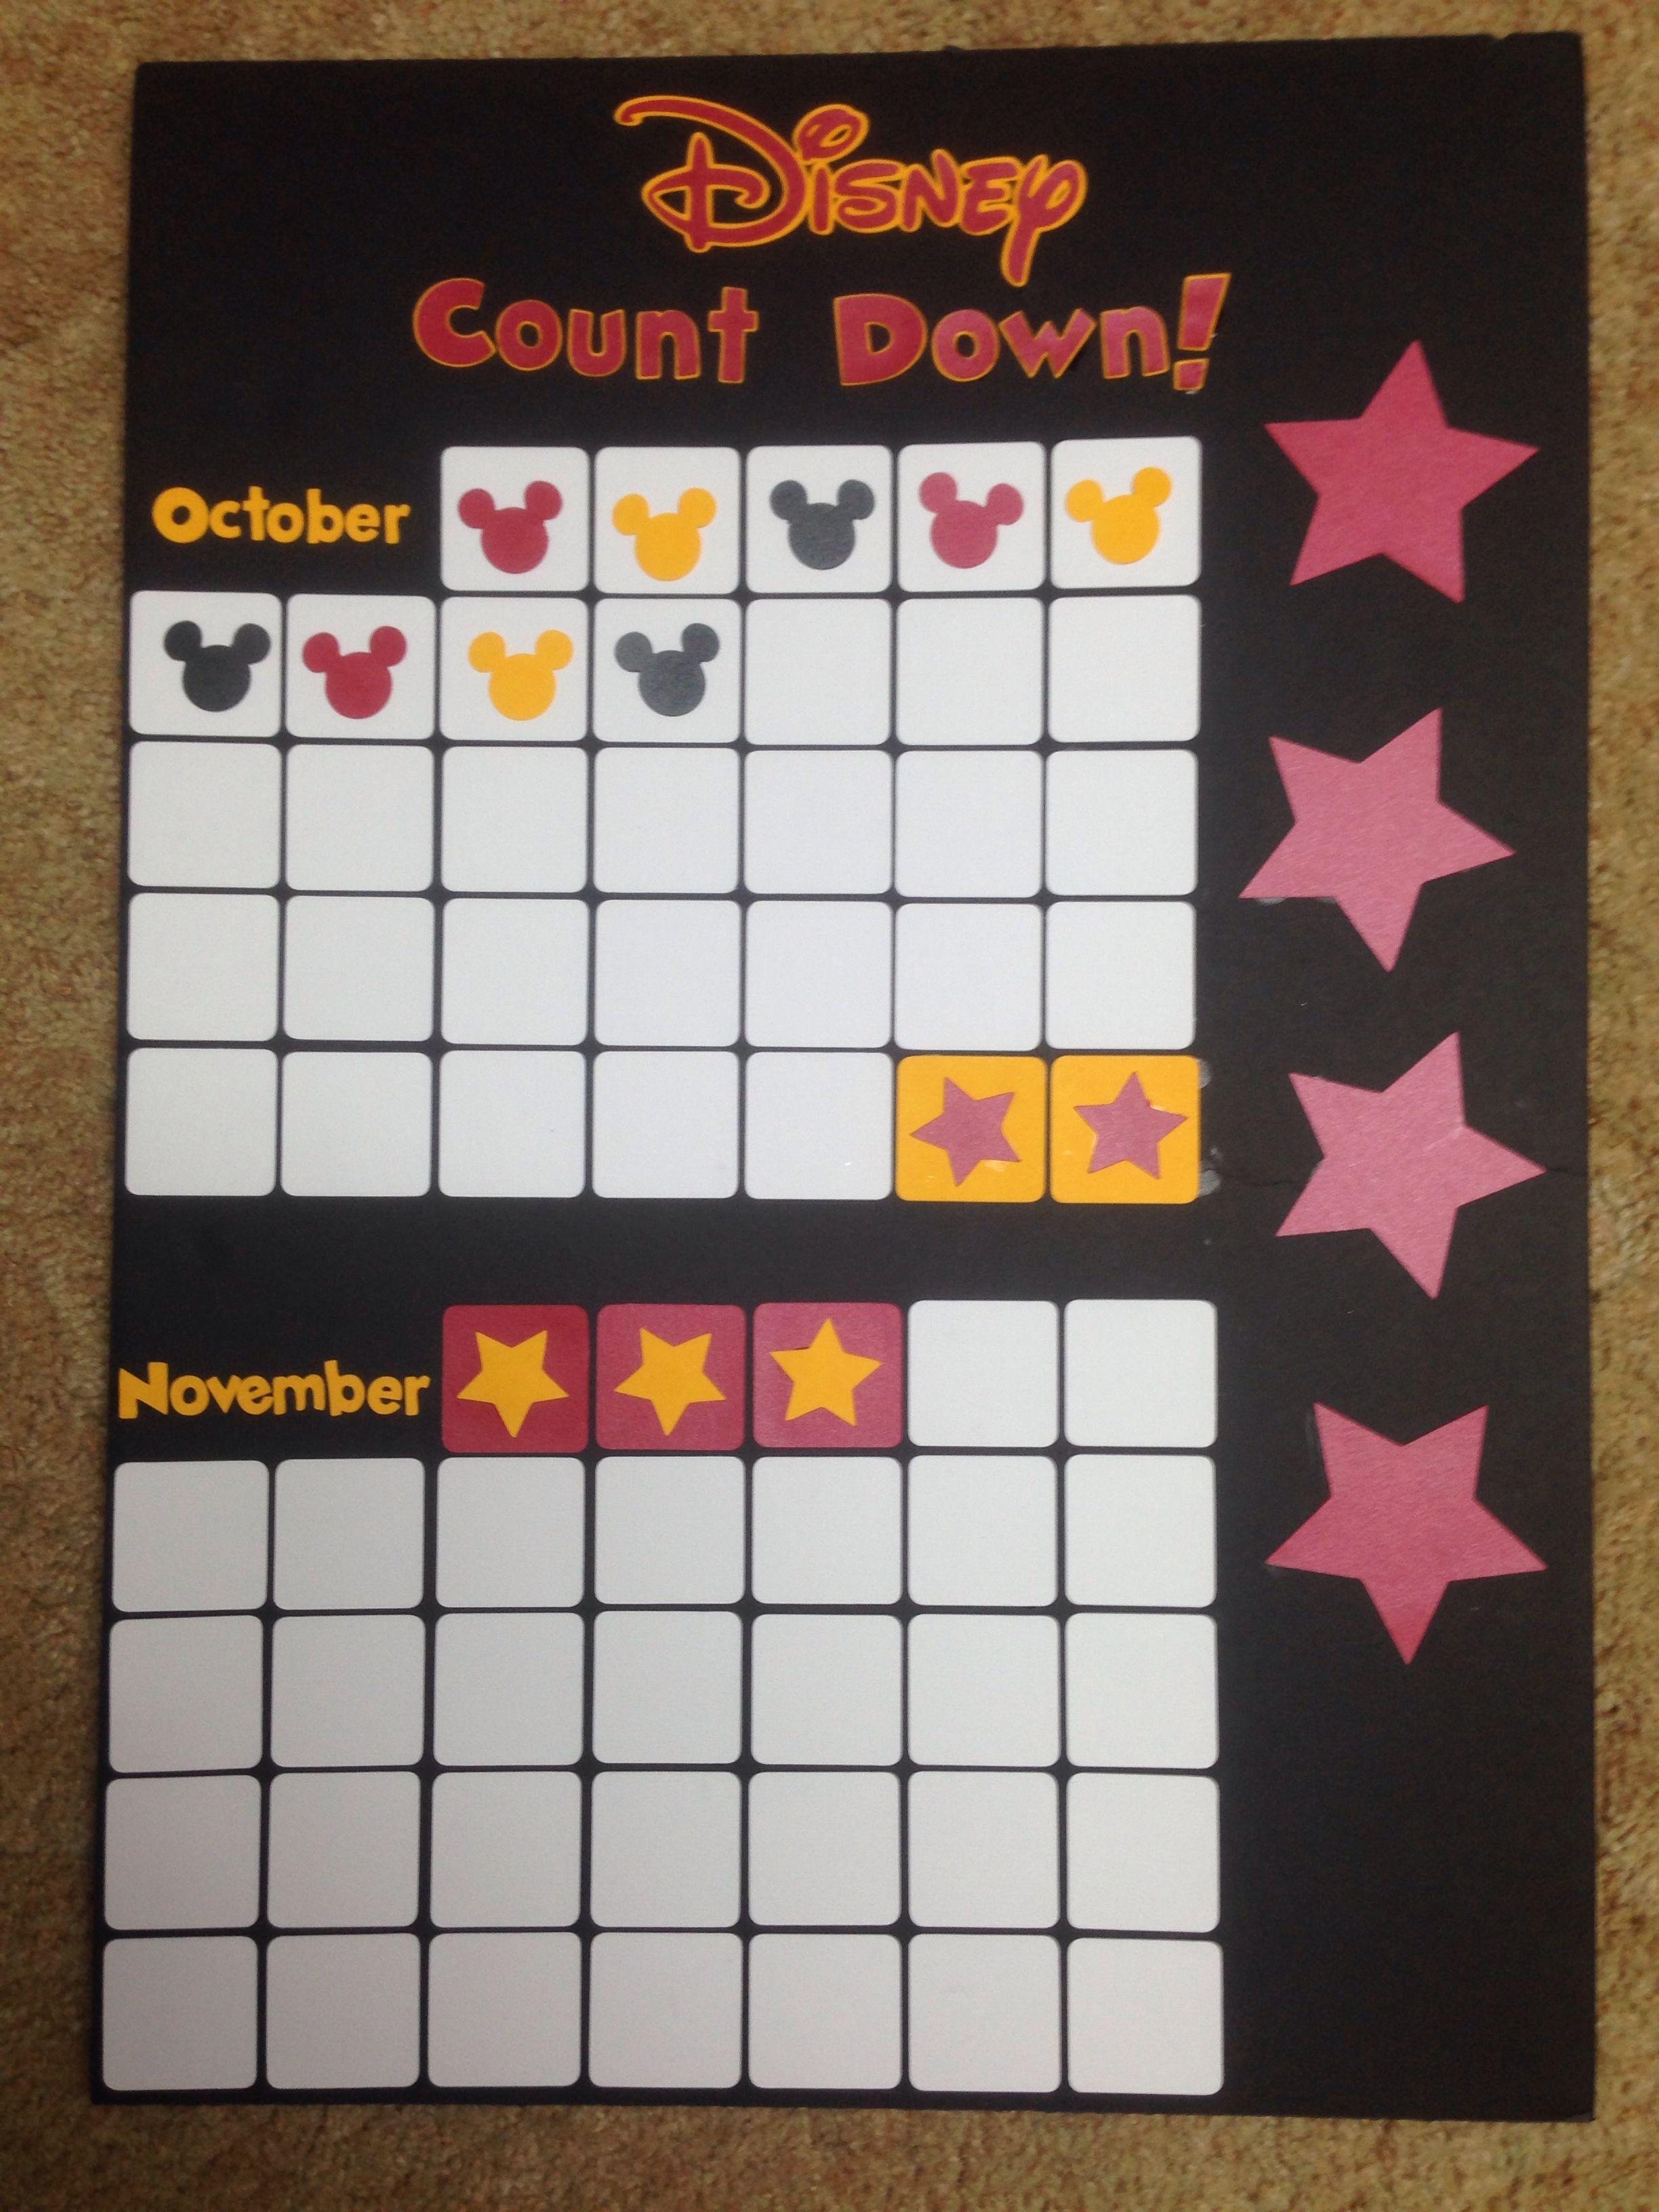 Disney Countdown Calendar! | Disney World Countdown intended for Disney World Countdown Calendar Printable